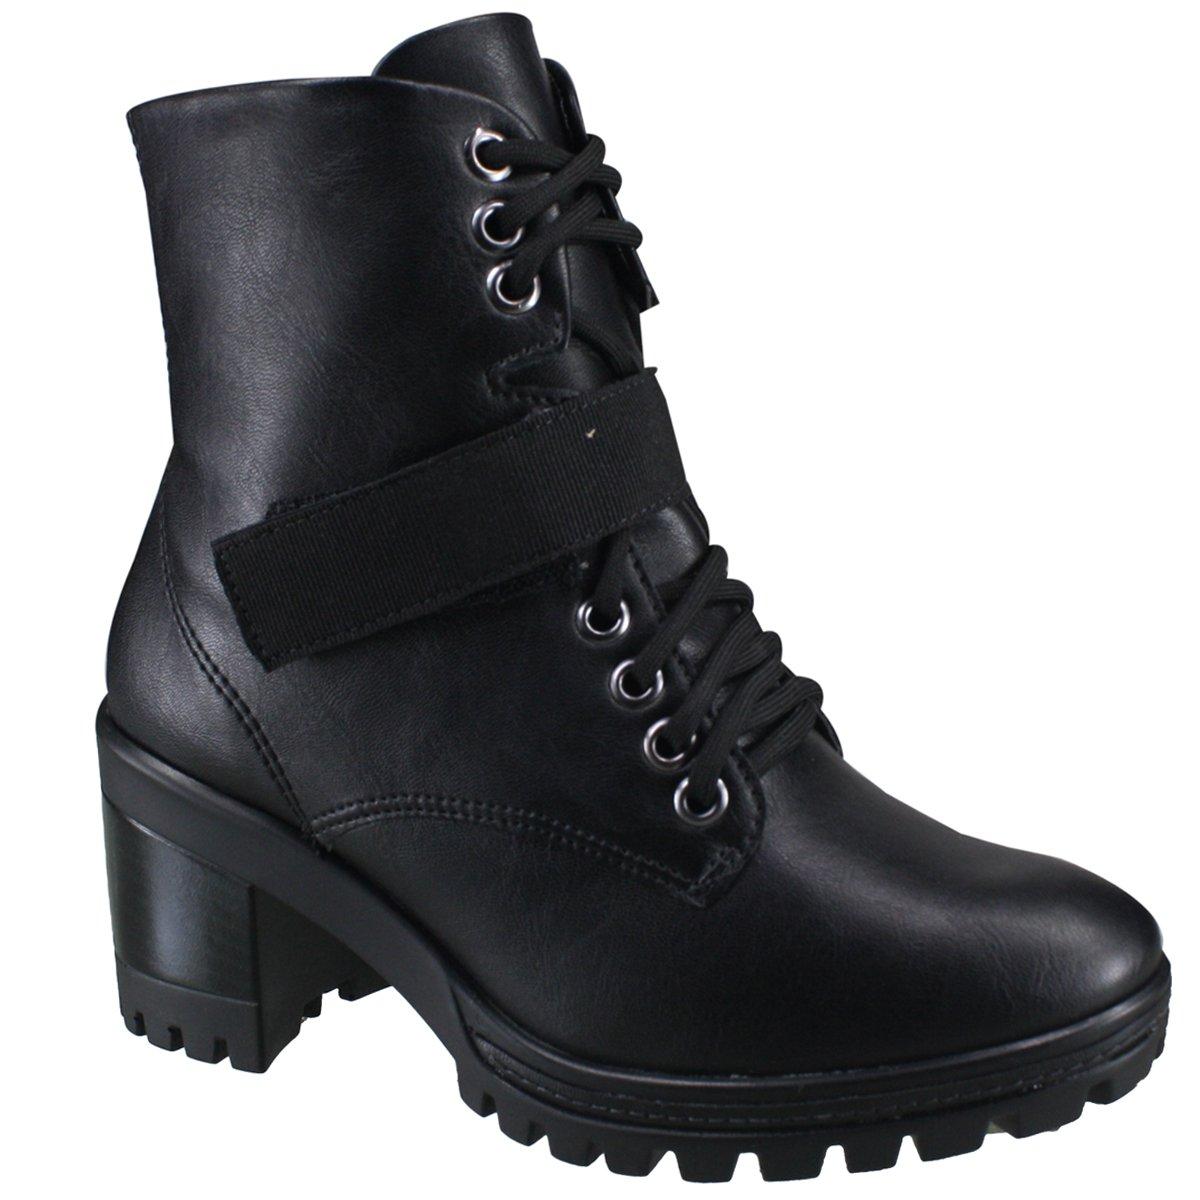 49ad5f02b13 Bota Ramarim Ankle Boot 18-50104 000006 - Preto (Naturale Plus Fita ...